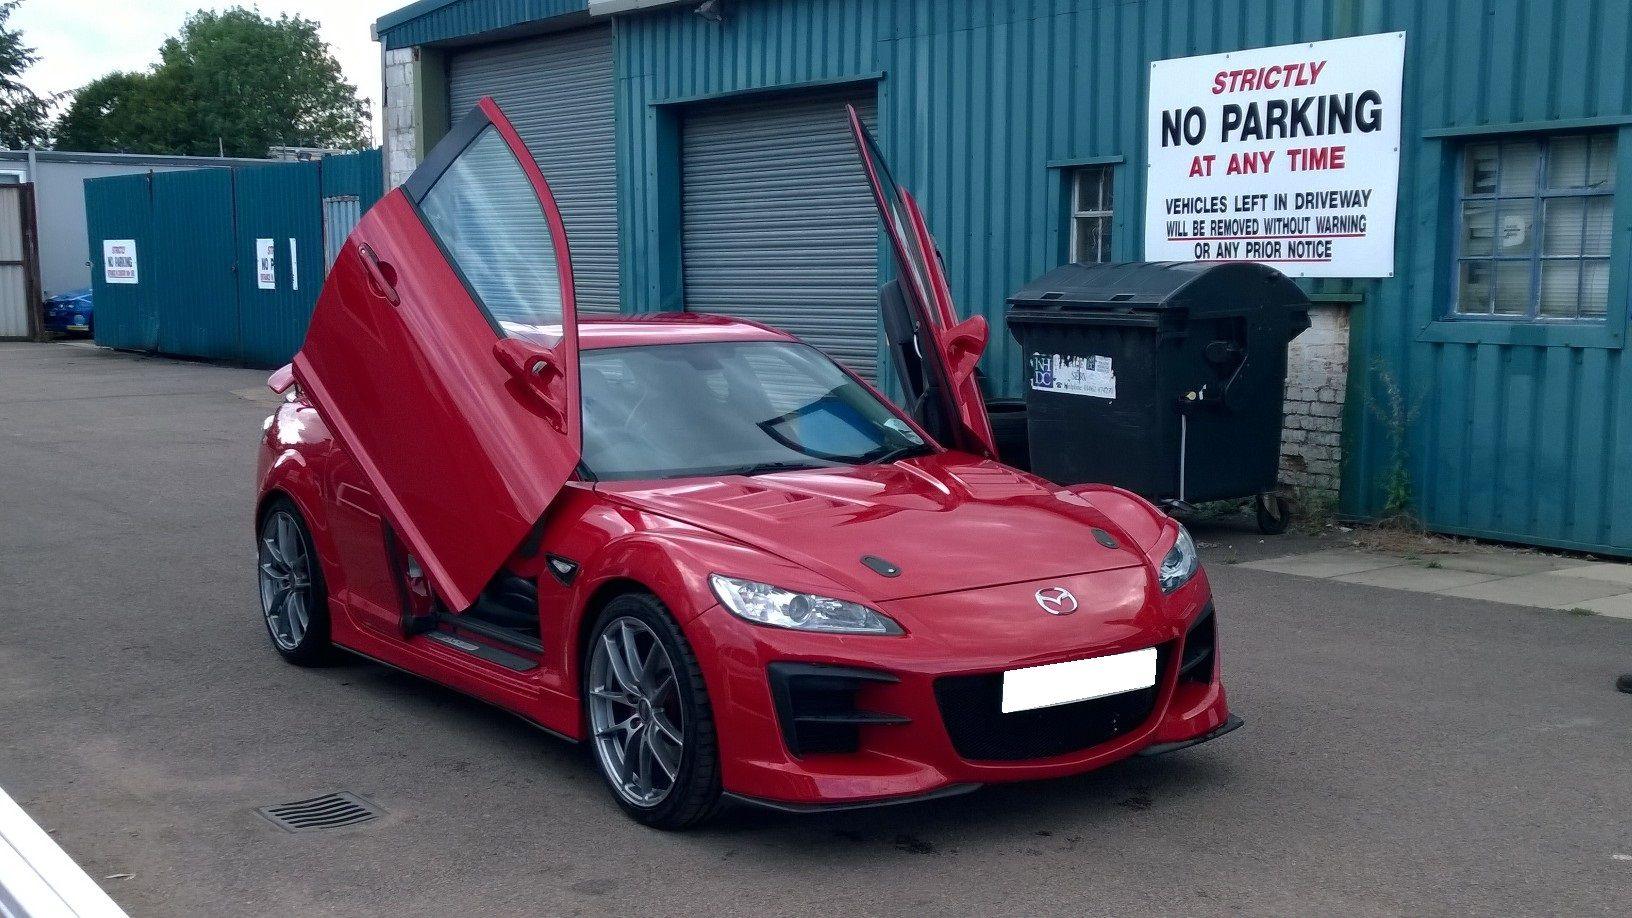 Mazda RX8 Modified M\u0027z Custom No Parking Renesis Lambo & Mazda RX8 Modified M\u0027z Custom No Parking Renesis Lambo Doors ...